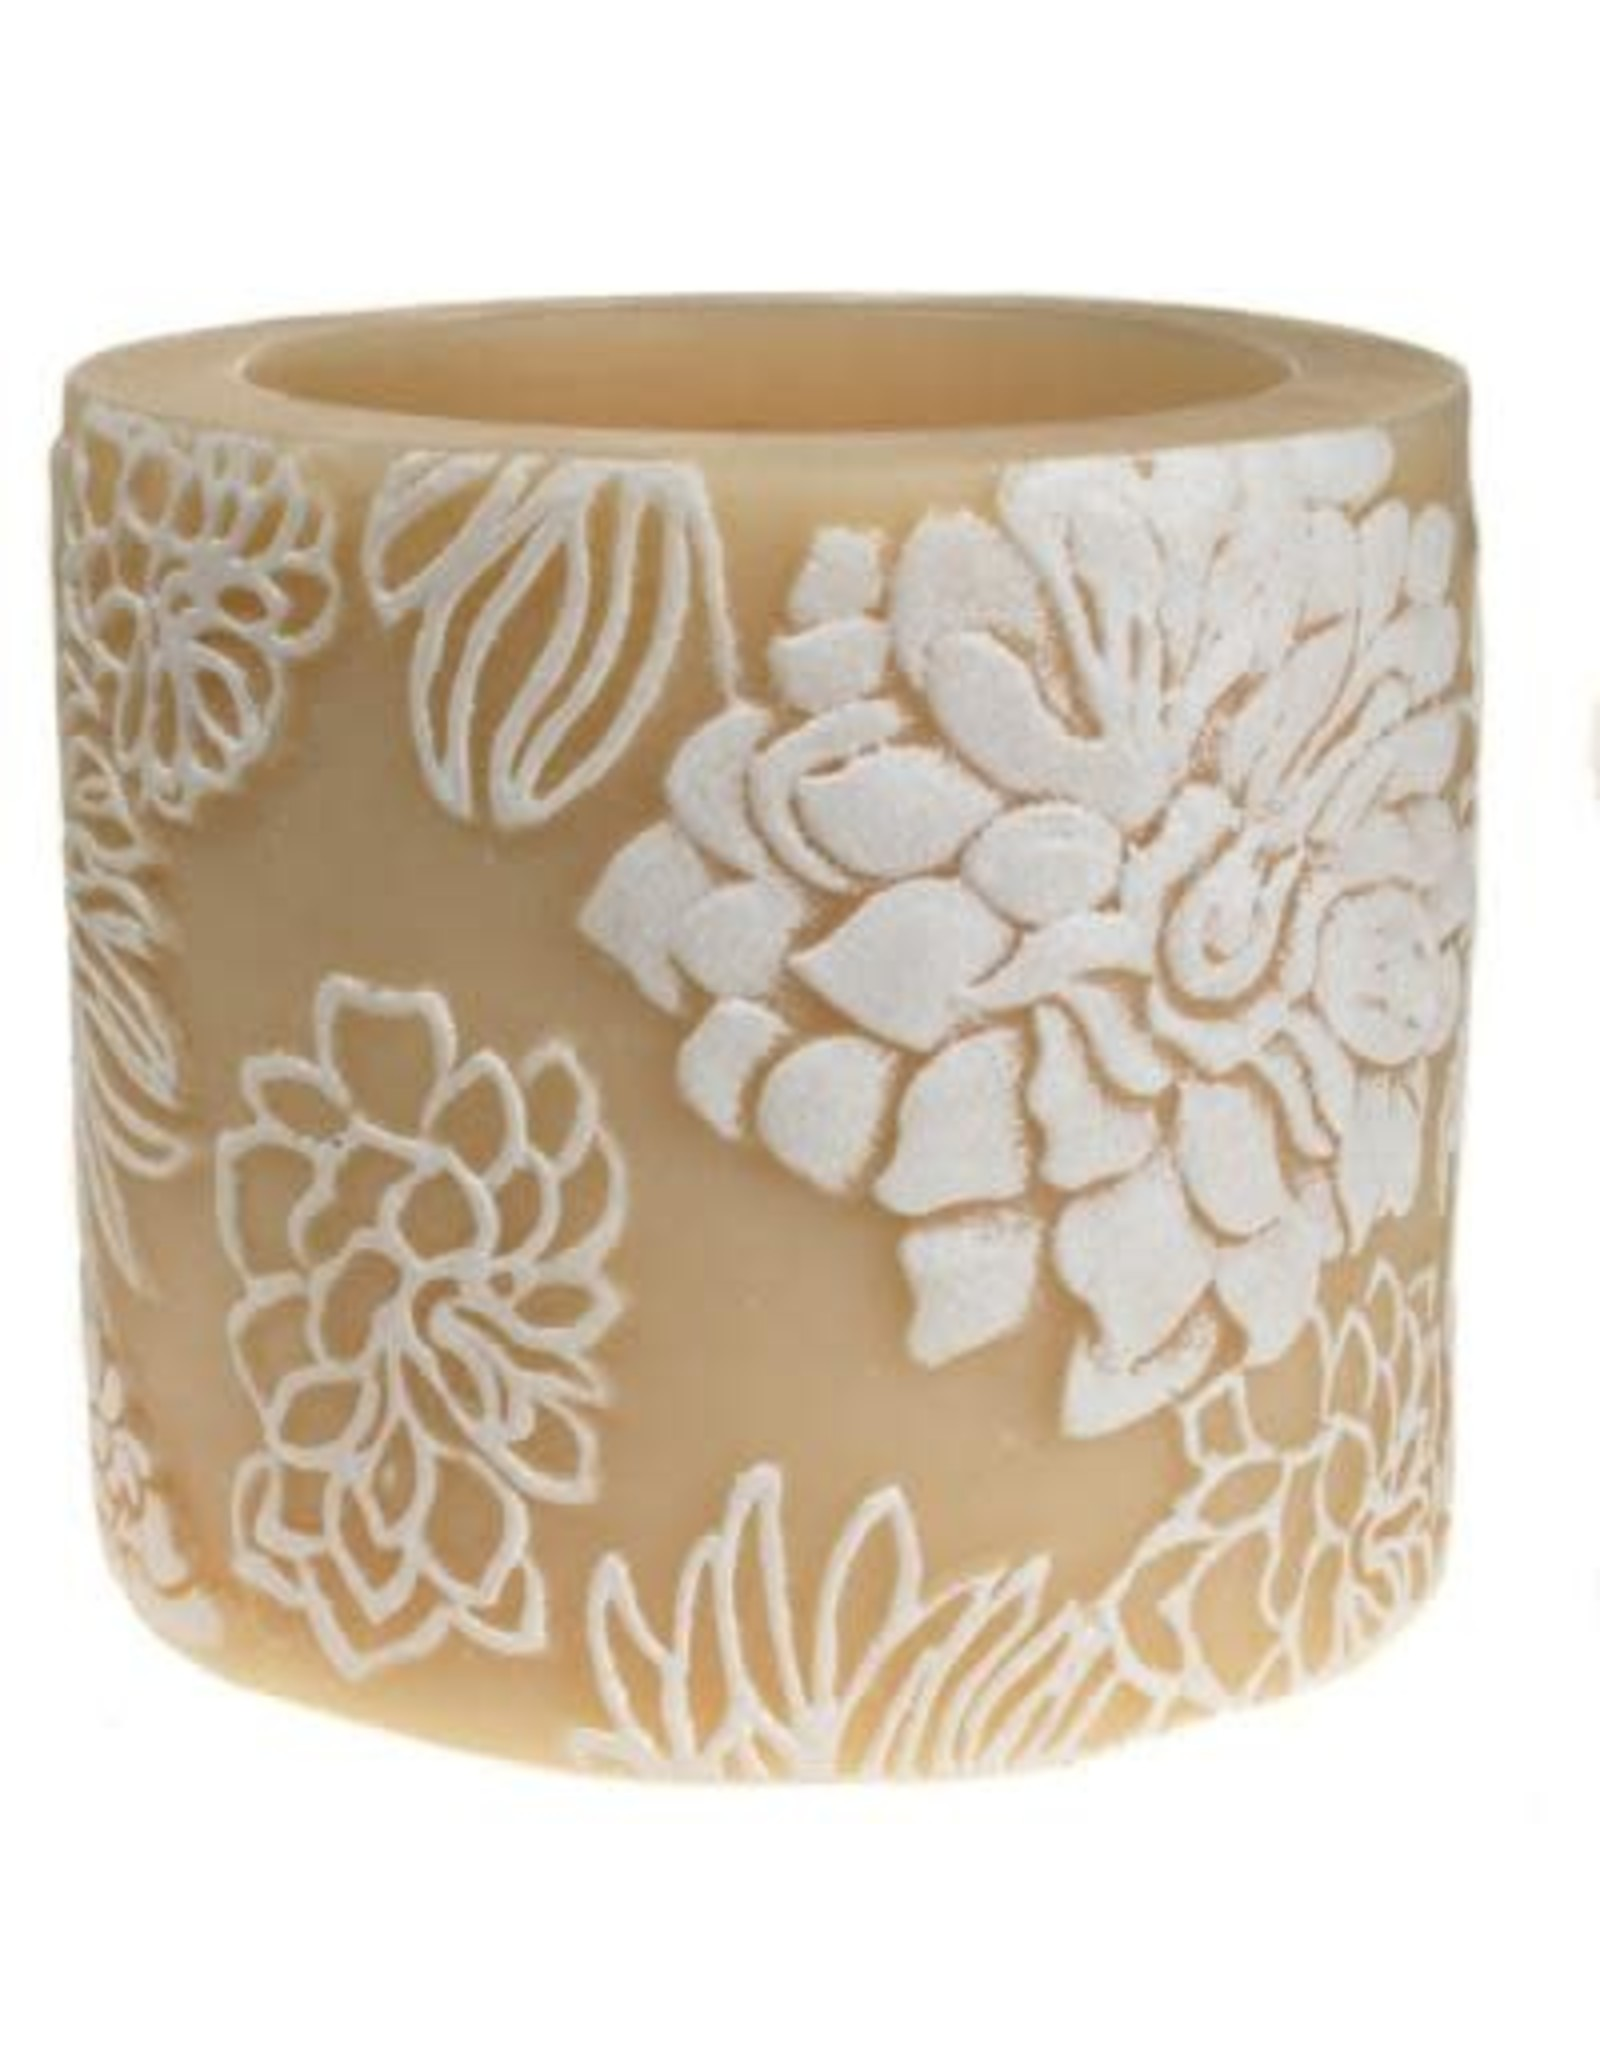 Candle Japanese chrysanthemum white + ivory